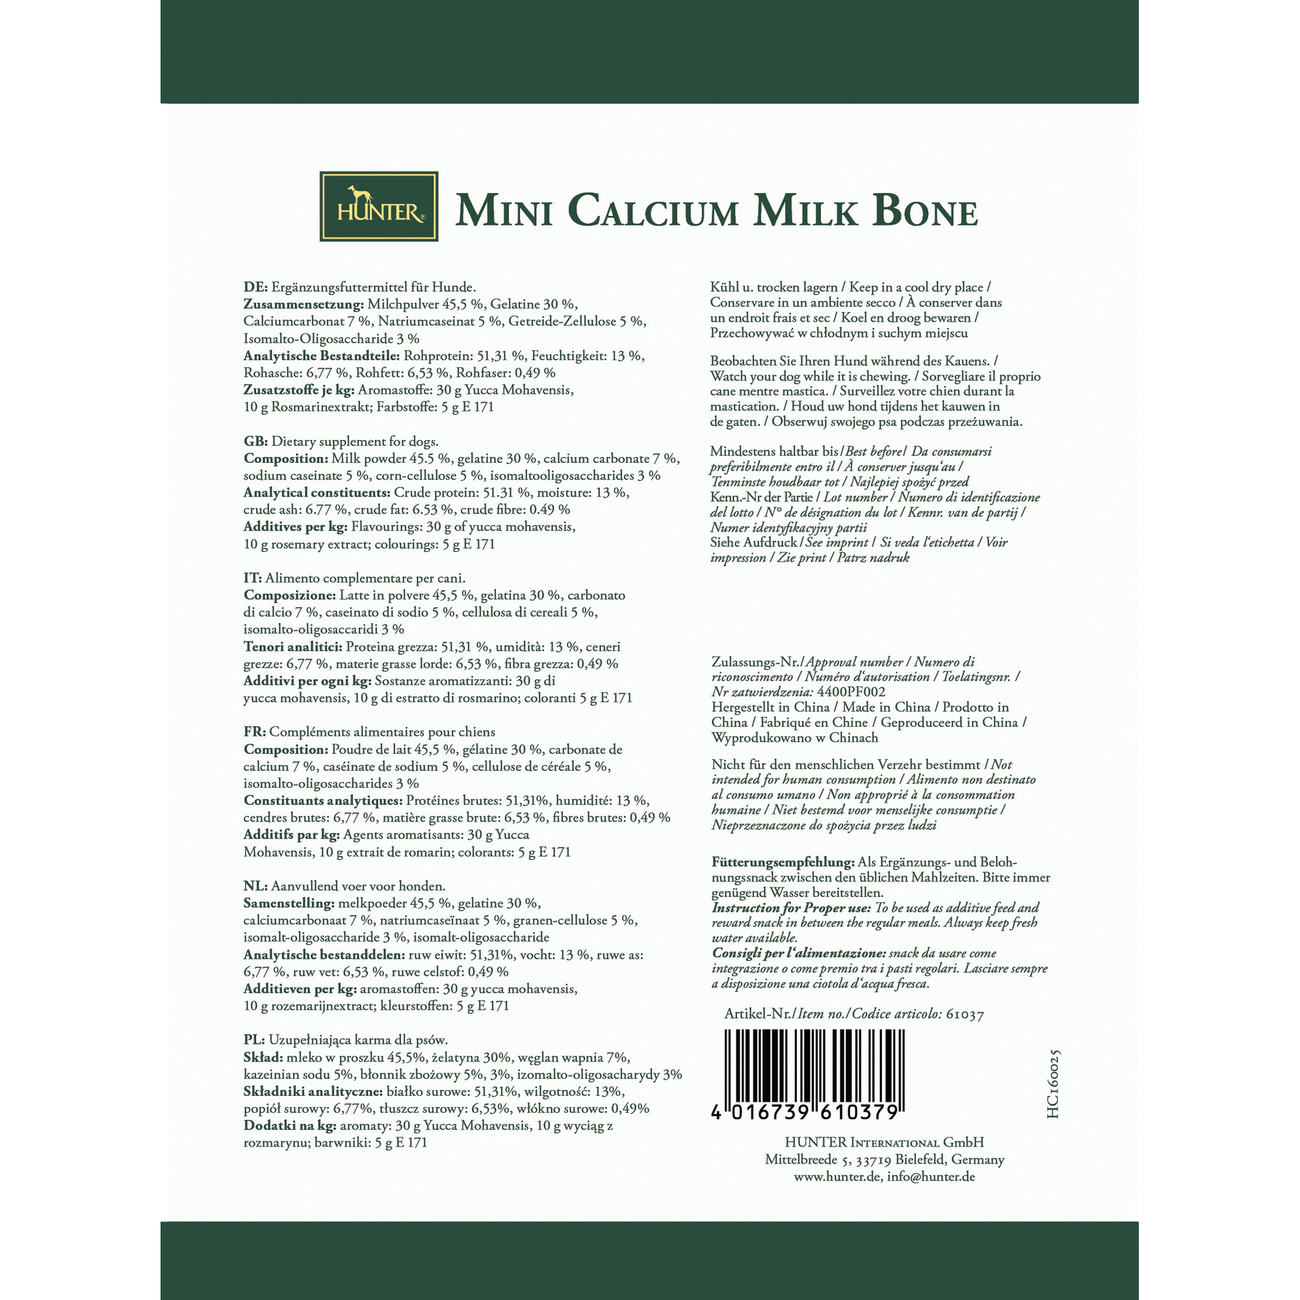 Hunter Hundesnack Mini Calcium Milk Bone für kleine Hunde 61037, Bild 3